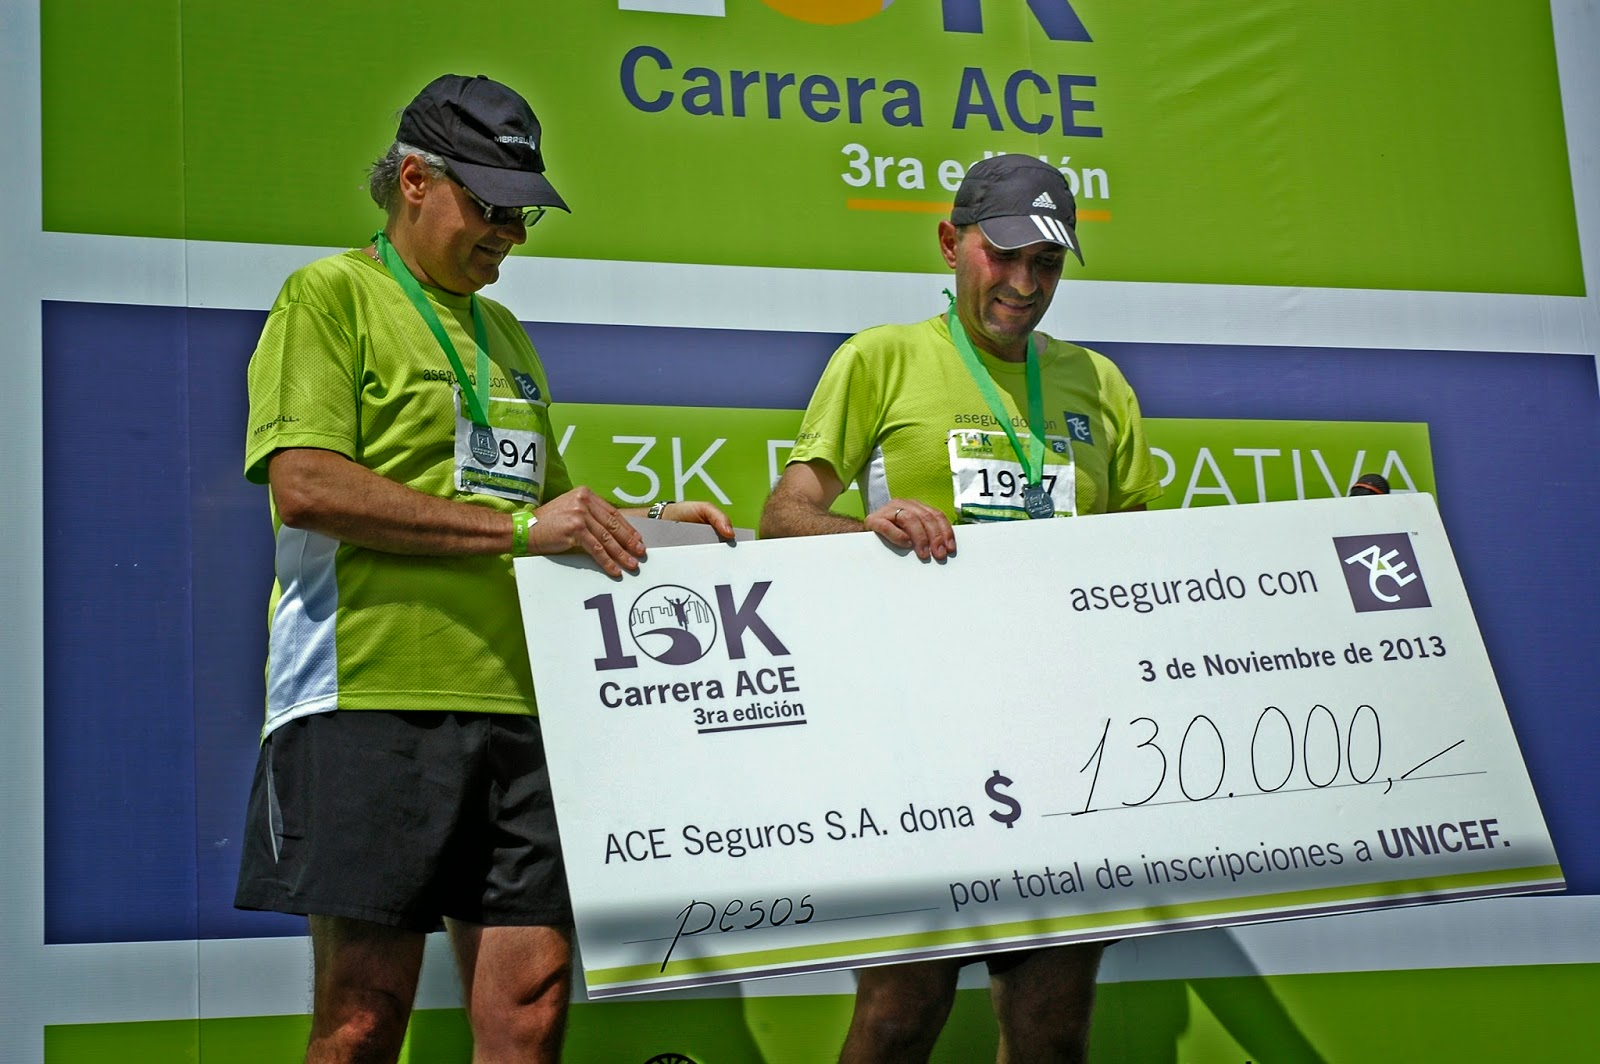 Carrera 10k ACE Seguros